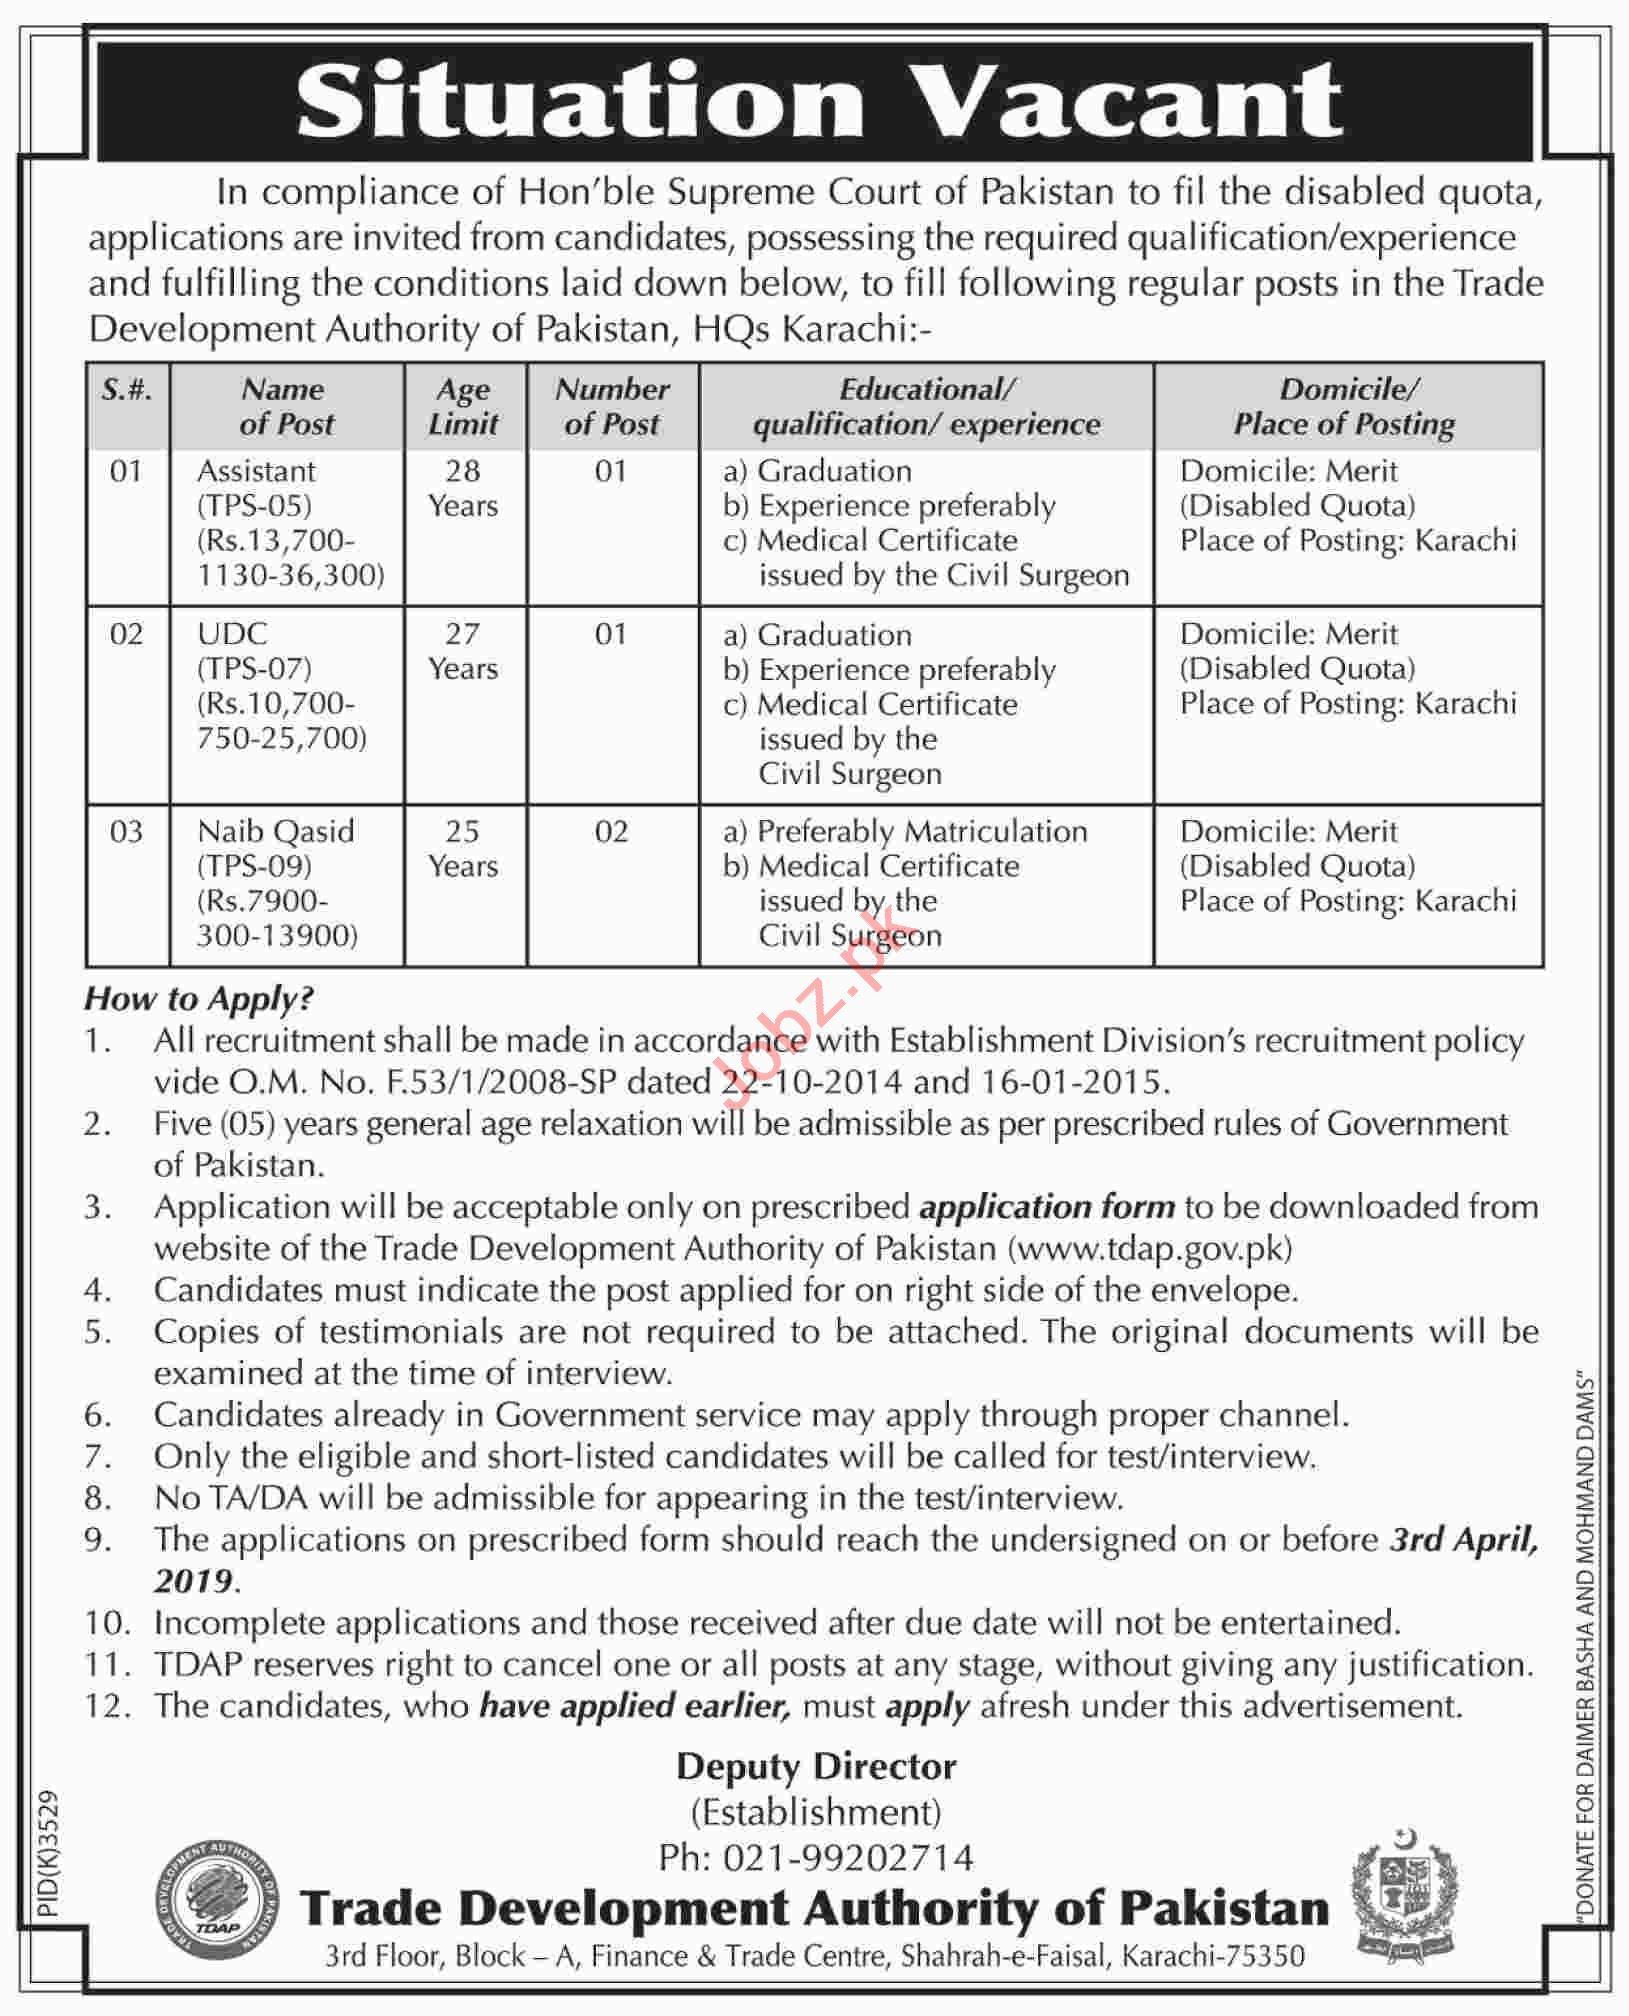 Trade Development Authority of Pakistan Management Job 2019